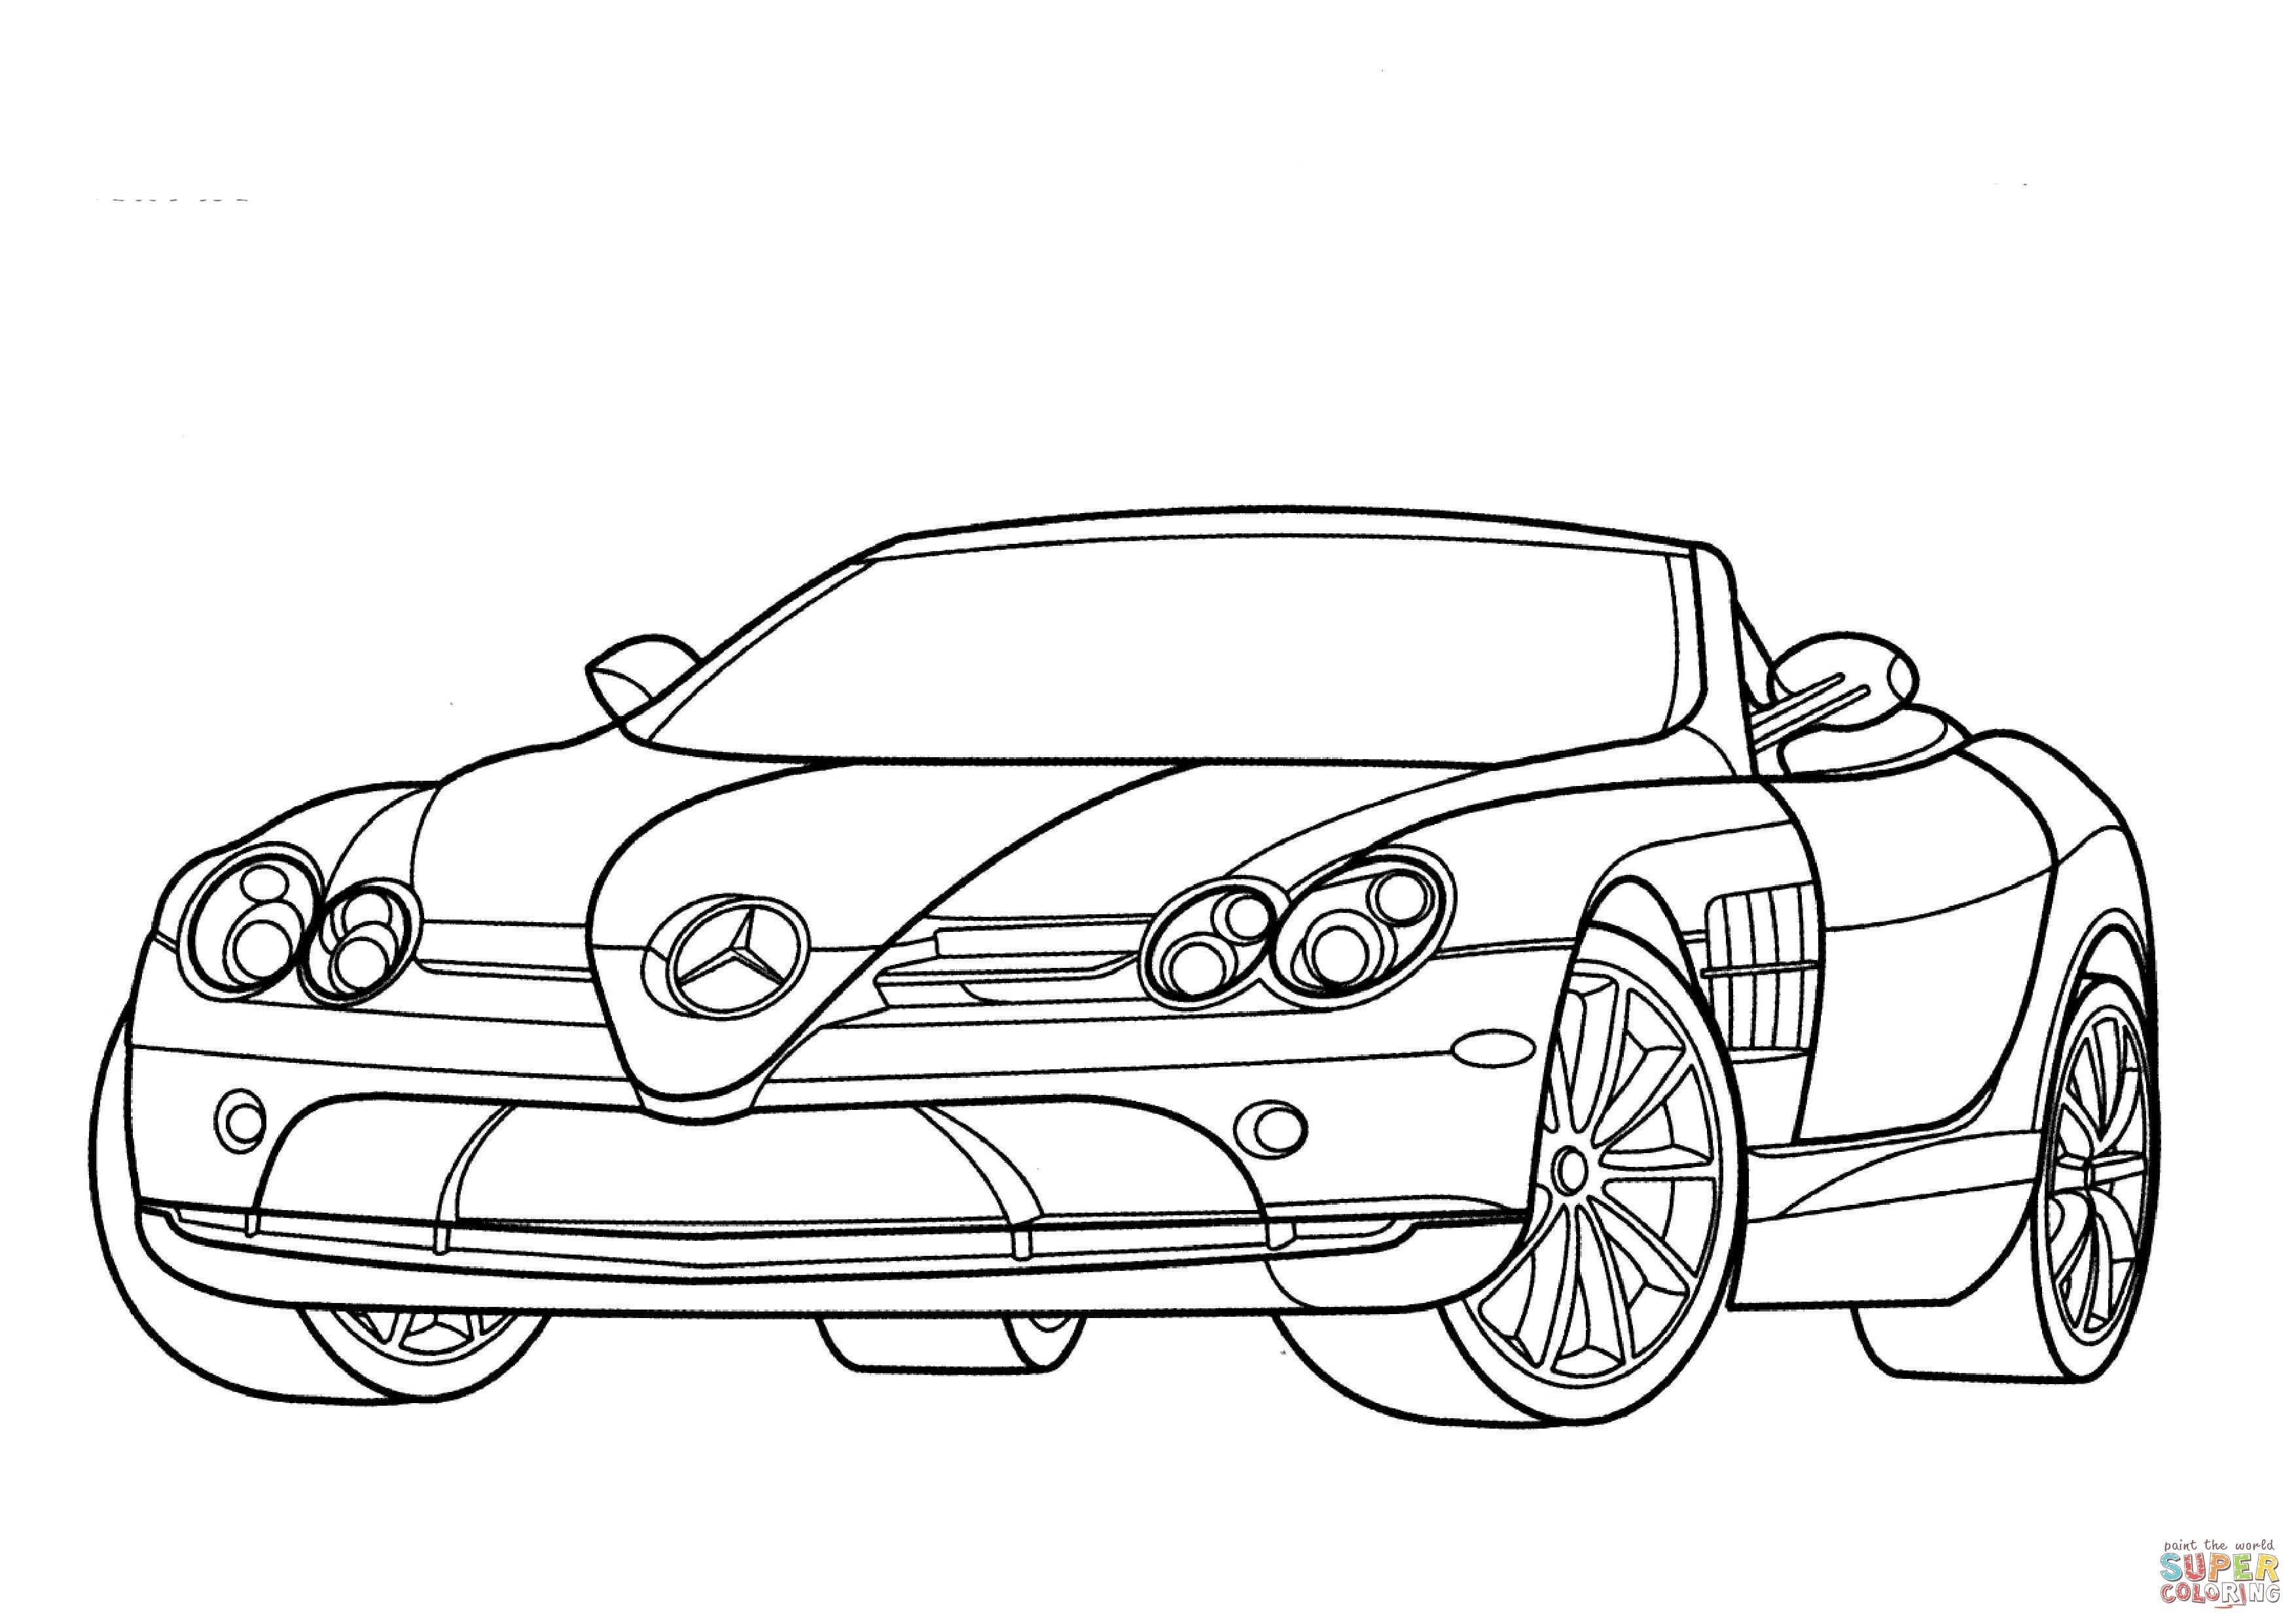 3508x2480 Super Car Mclaren F1 Lm Coloring Page Fresh Drawn Bmw Coloring